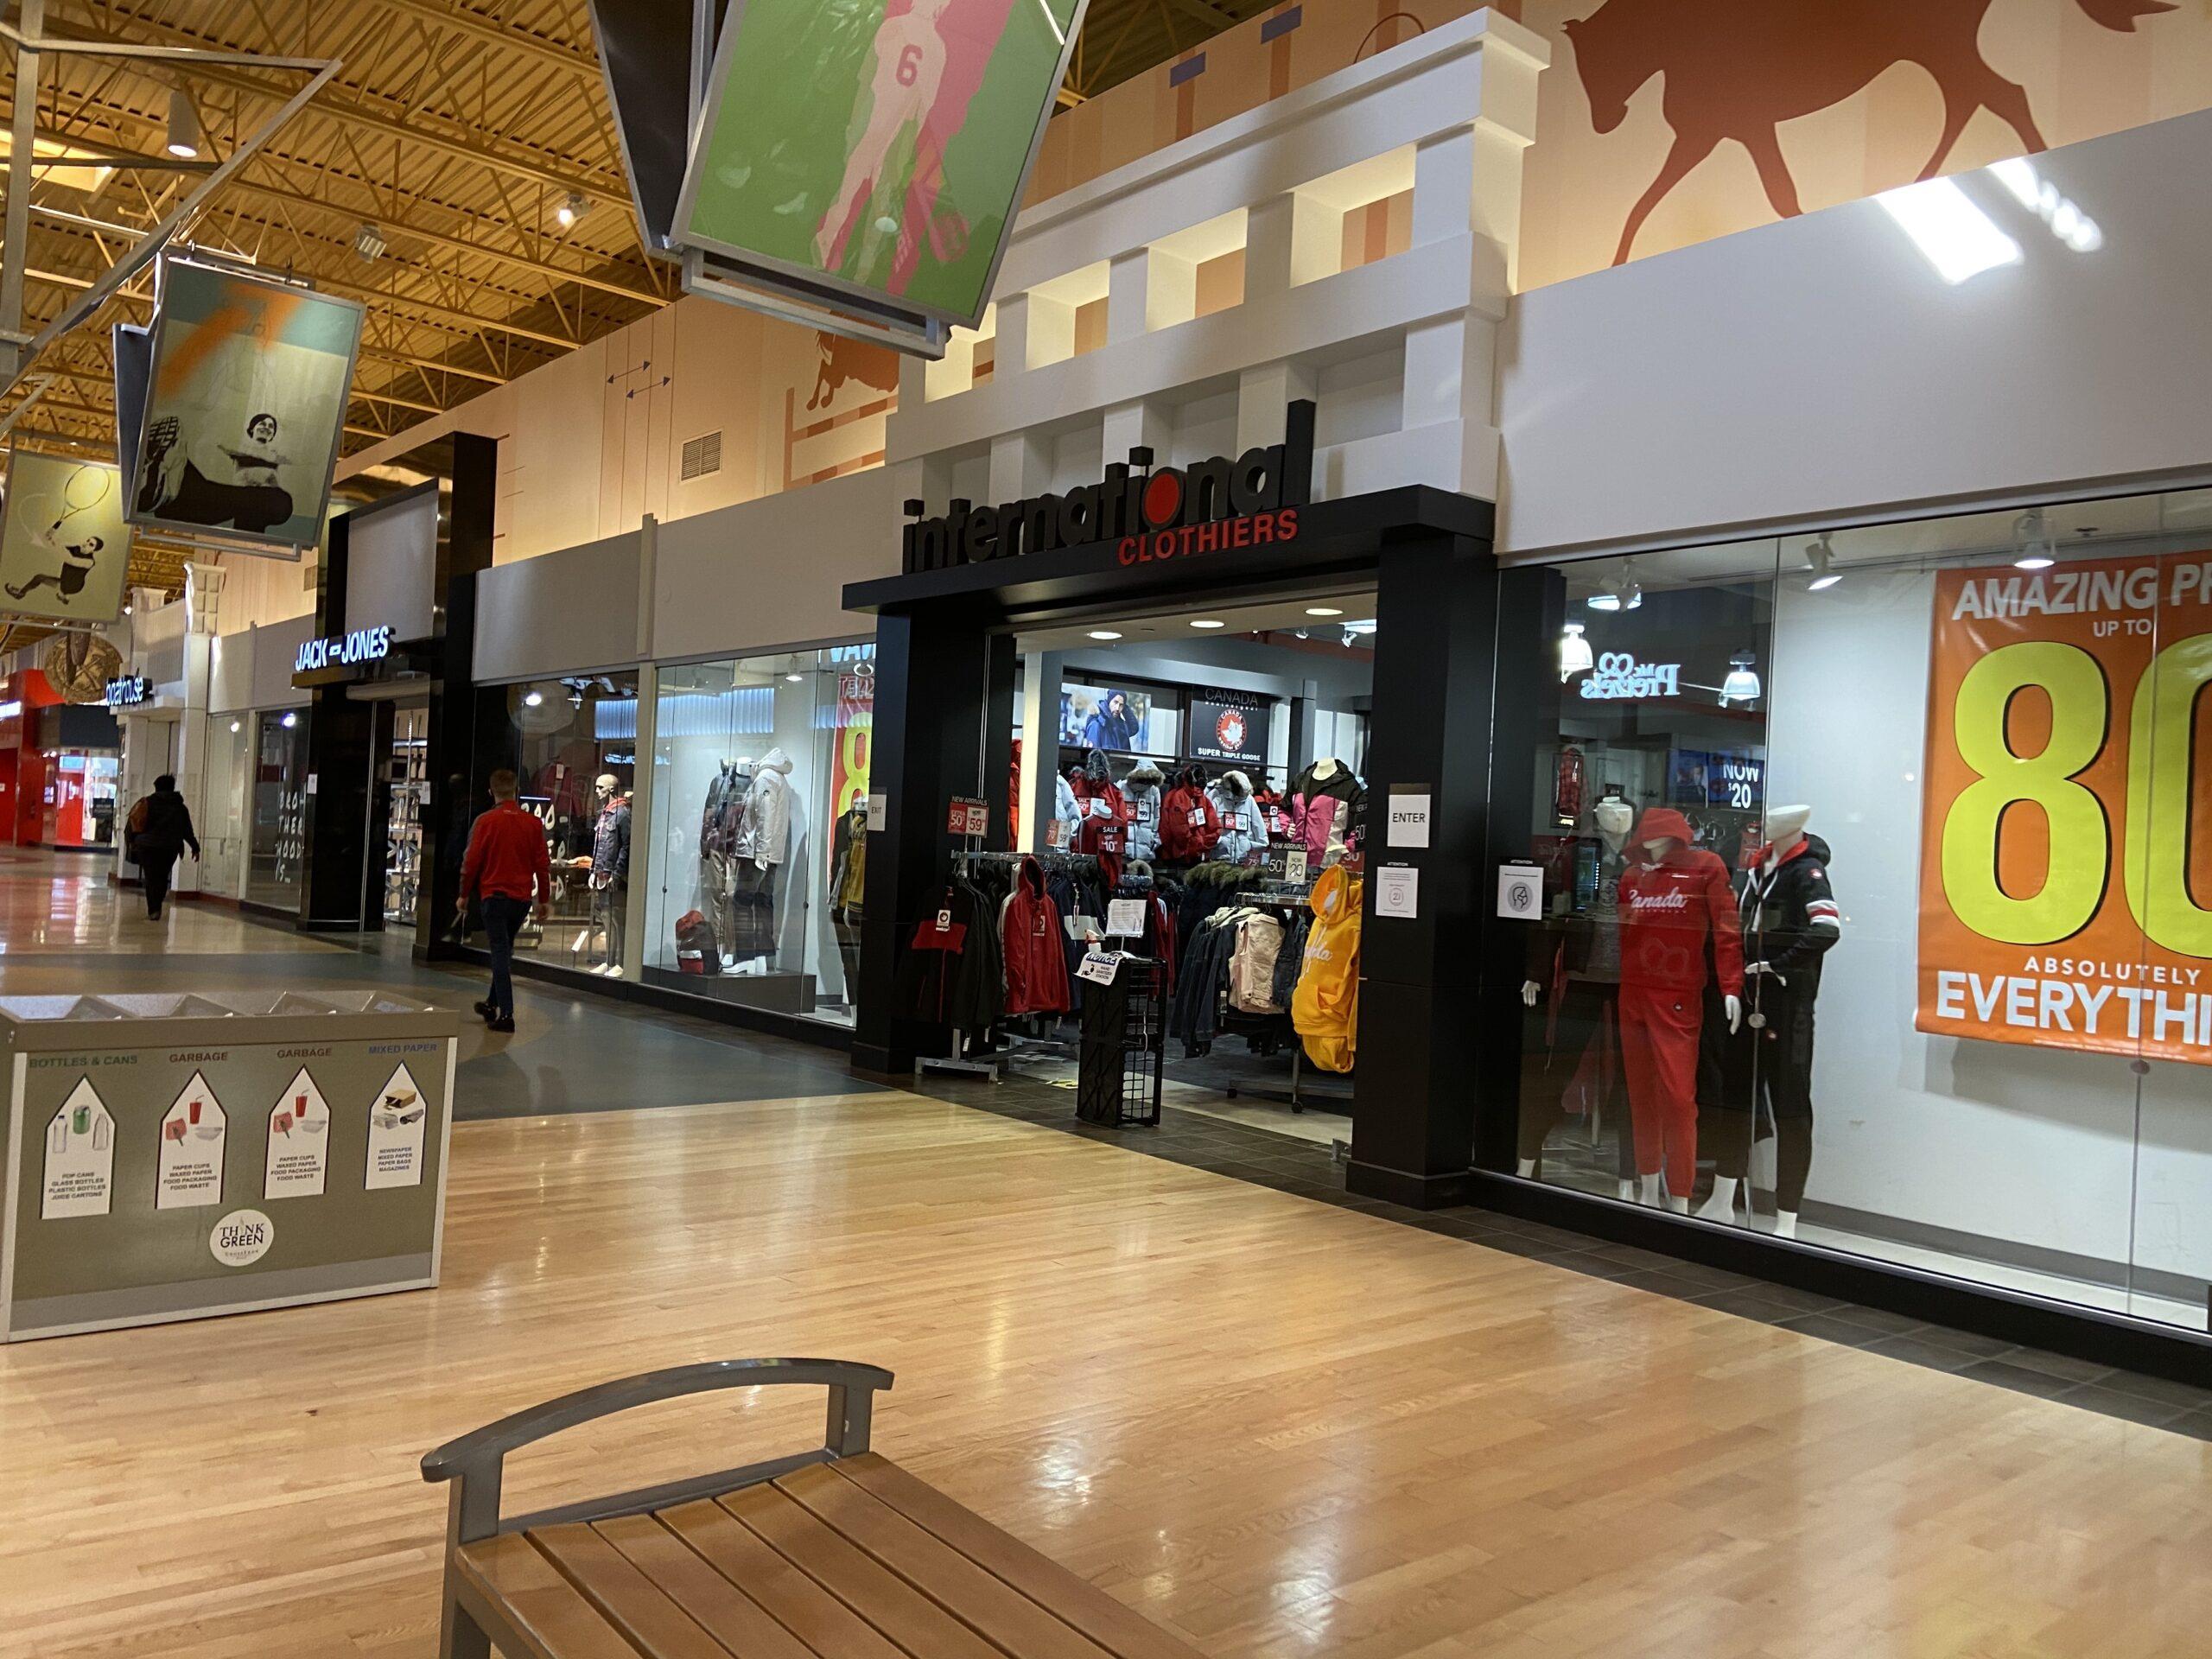 International Clothiers at CrossIron Mills.